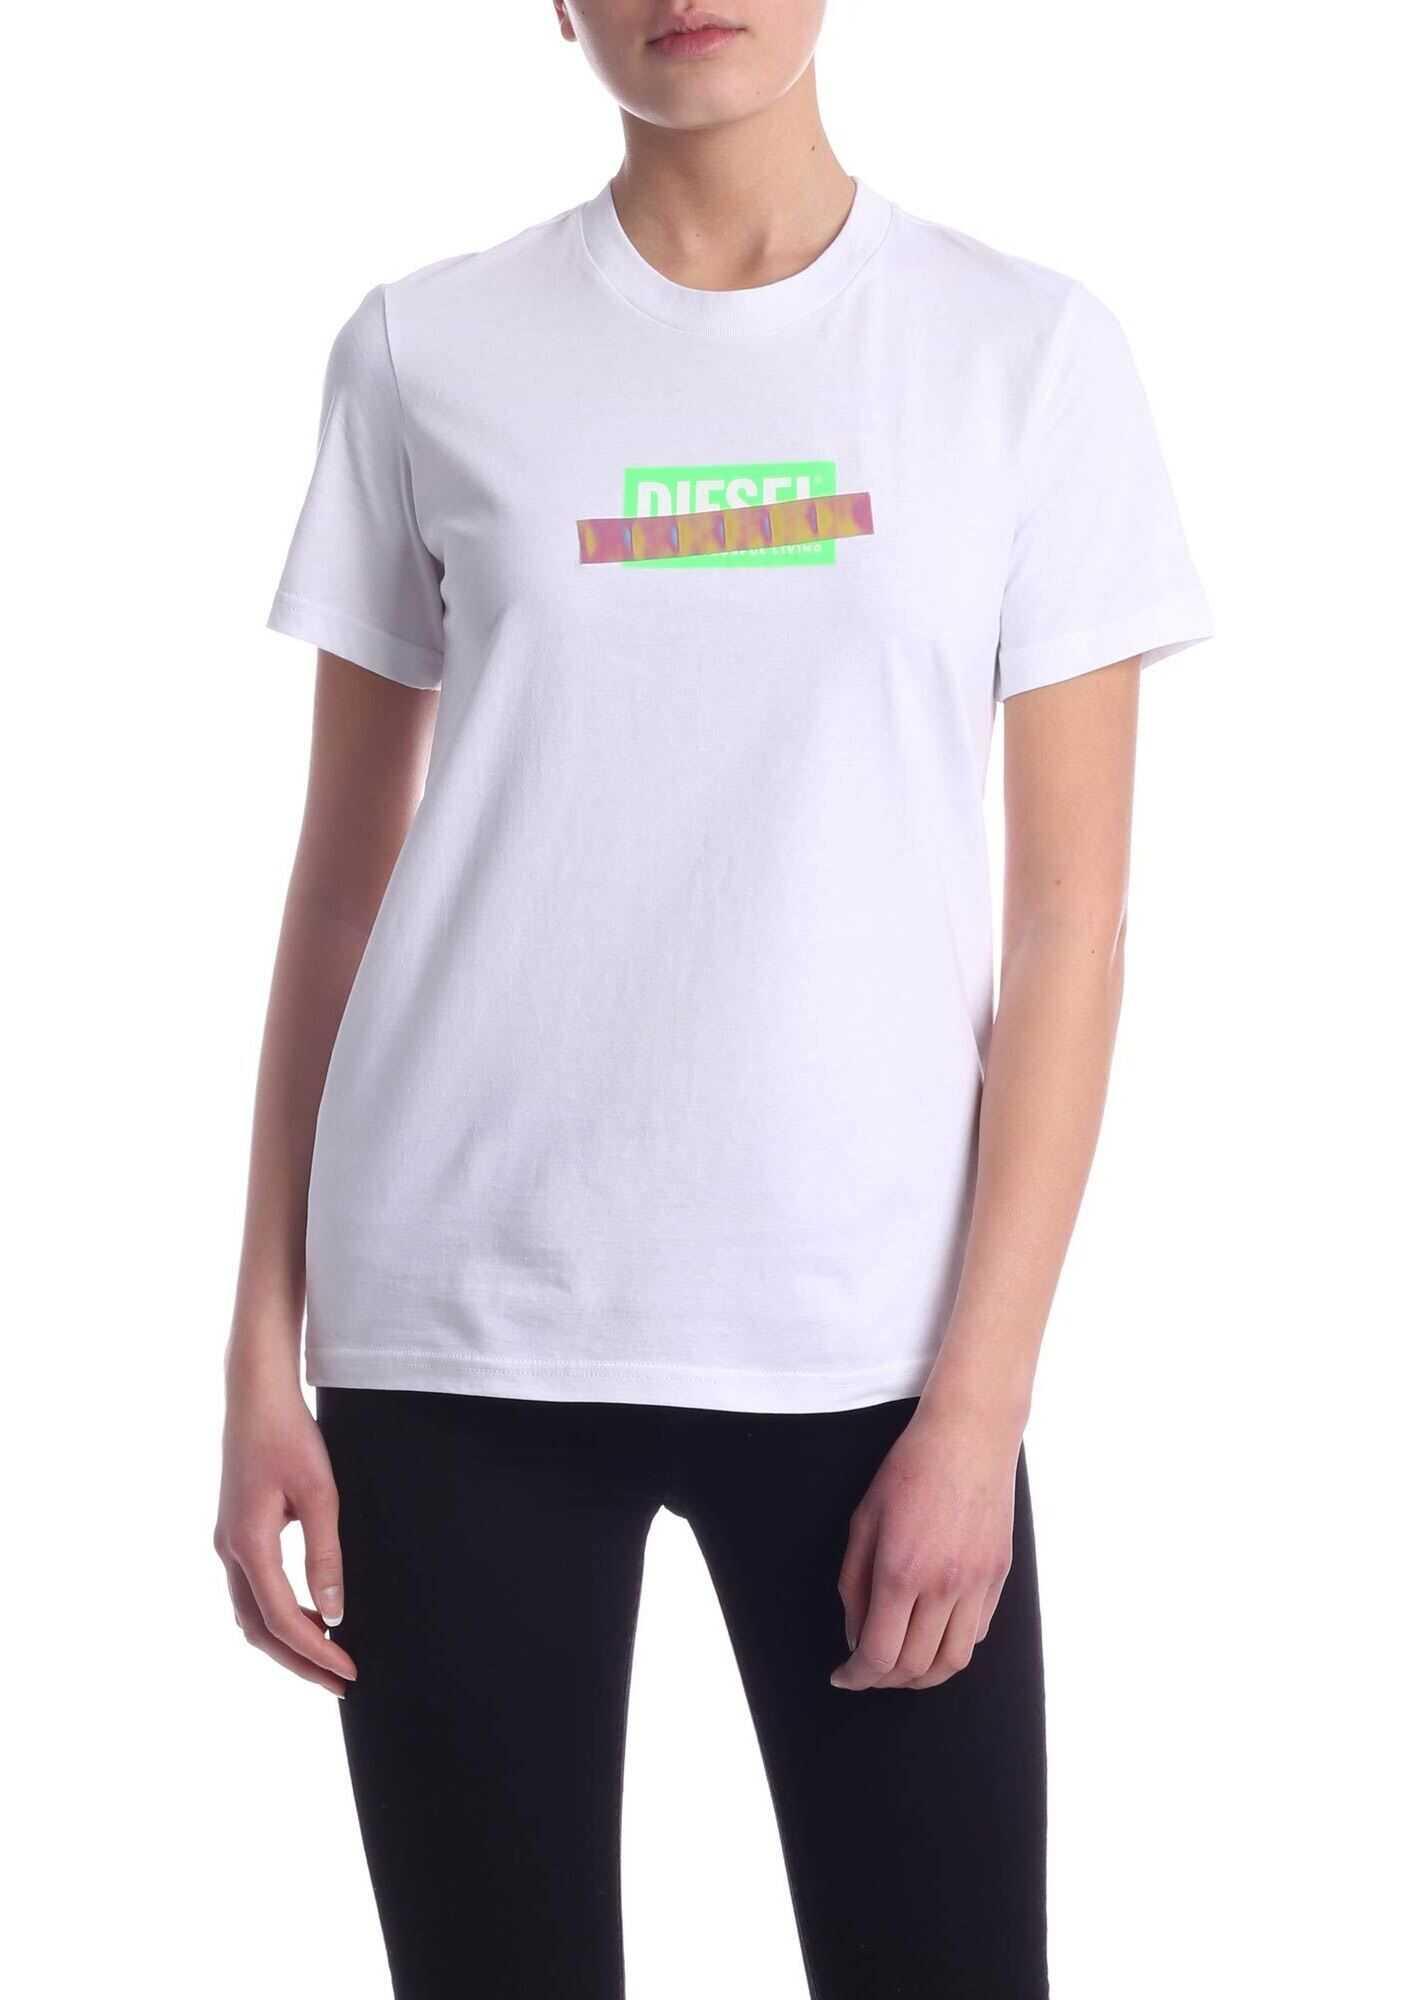 Diesel Sily-S2 T-Shirt In White White